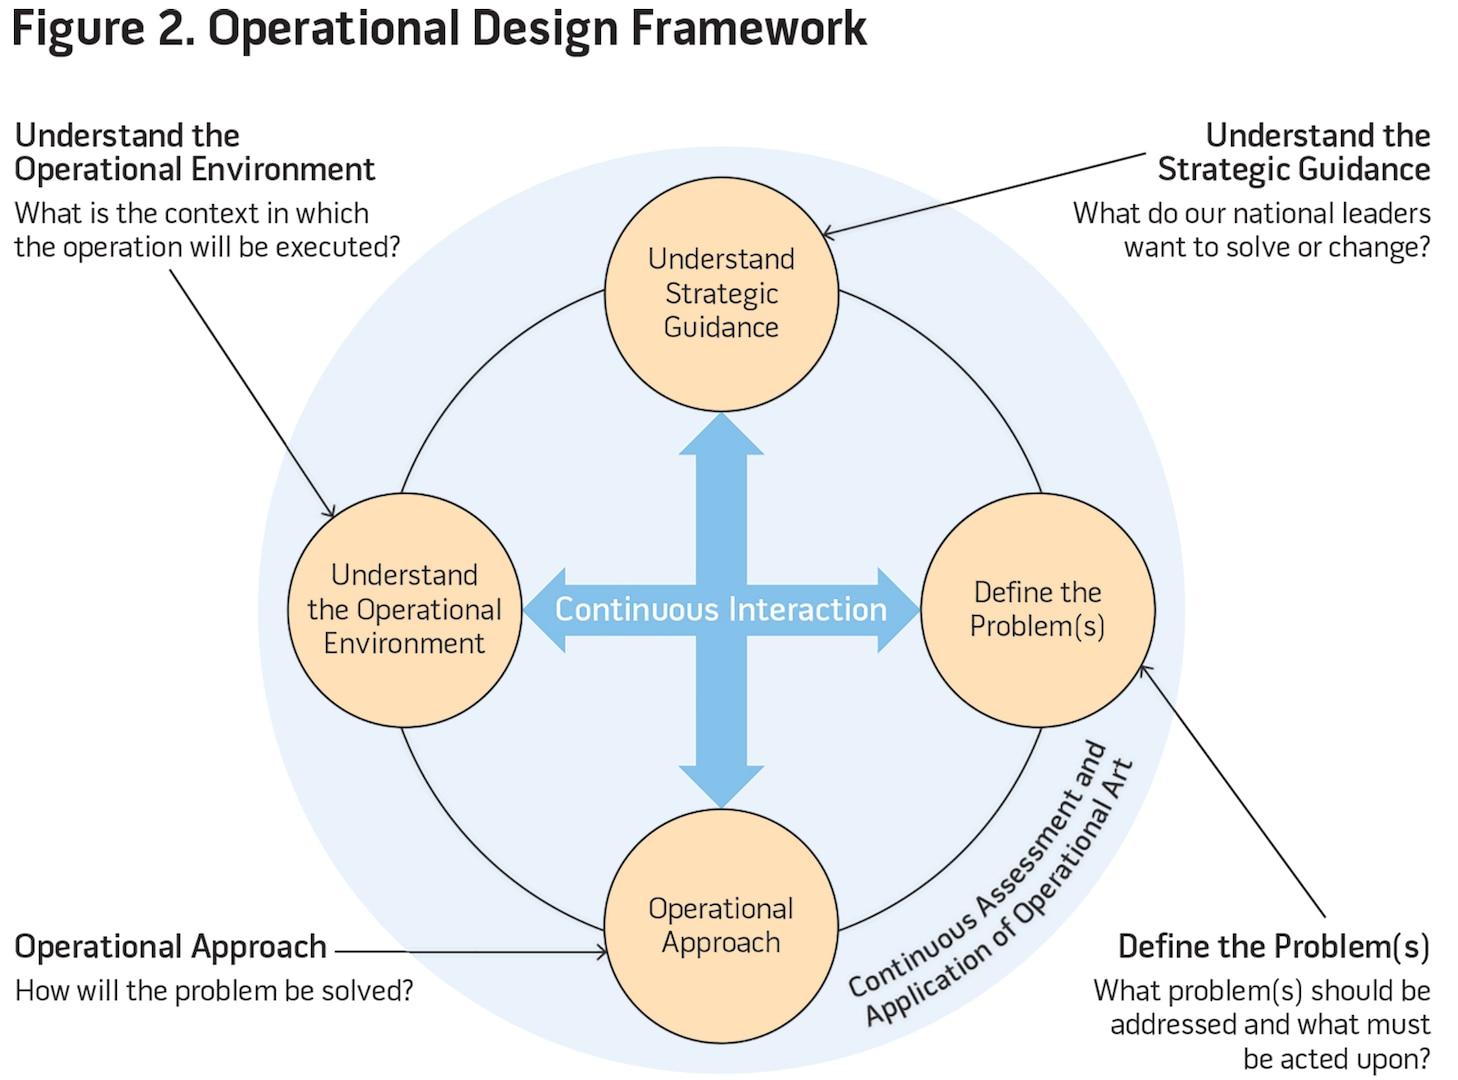 Figure 2. Operational Design Framework